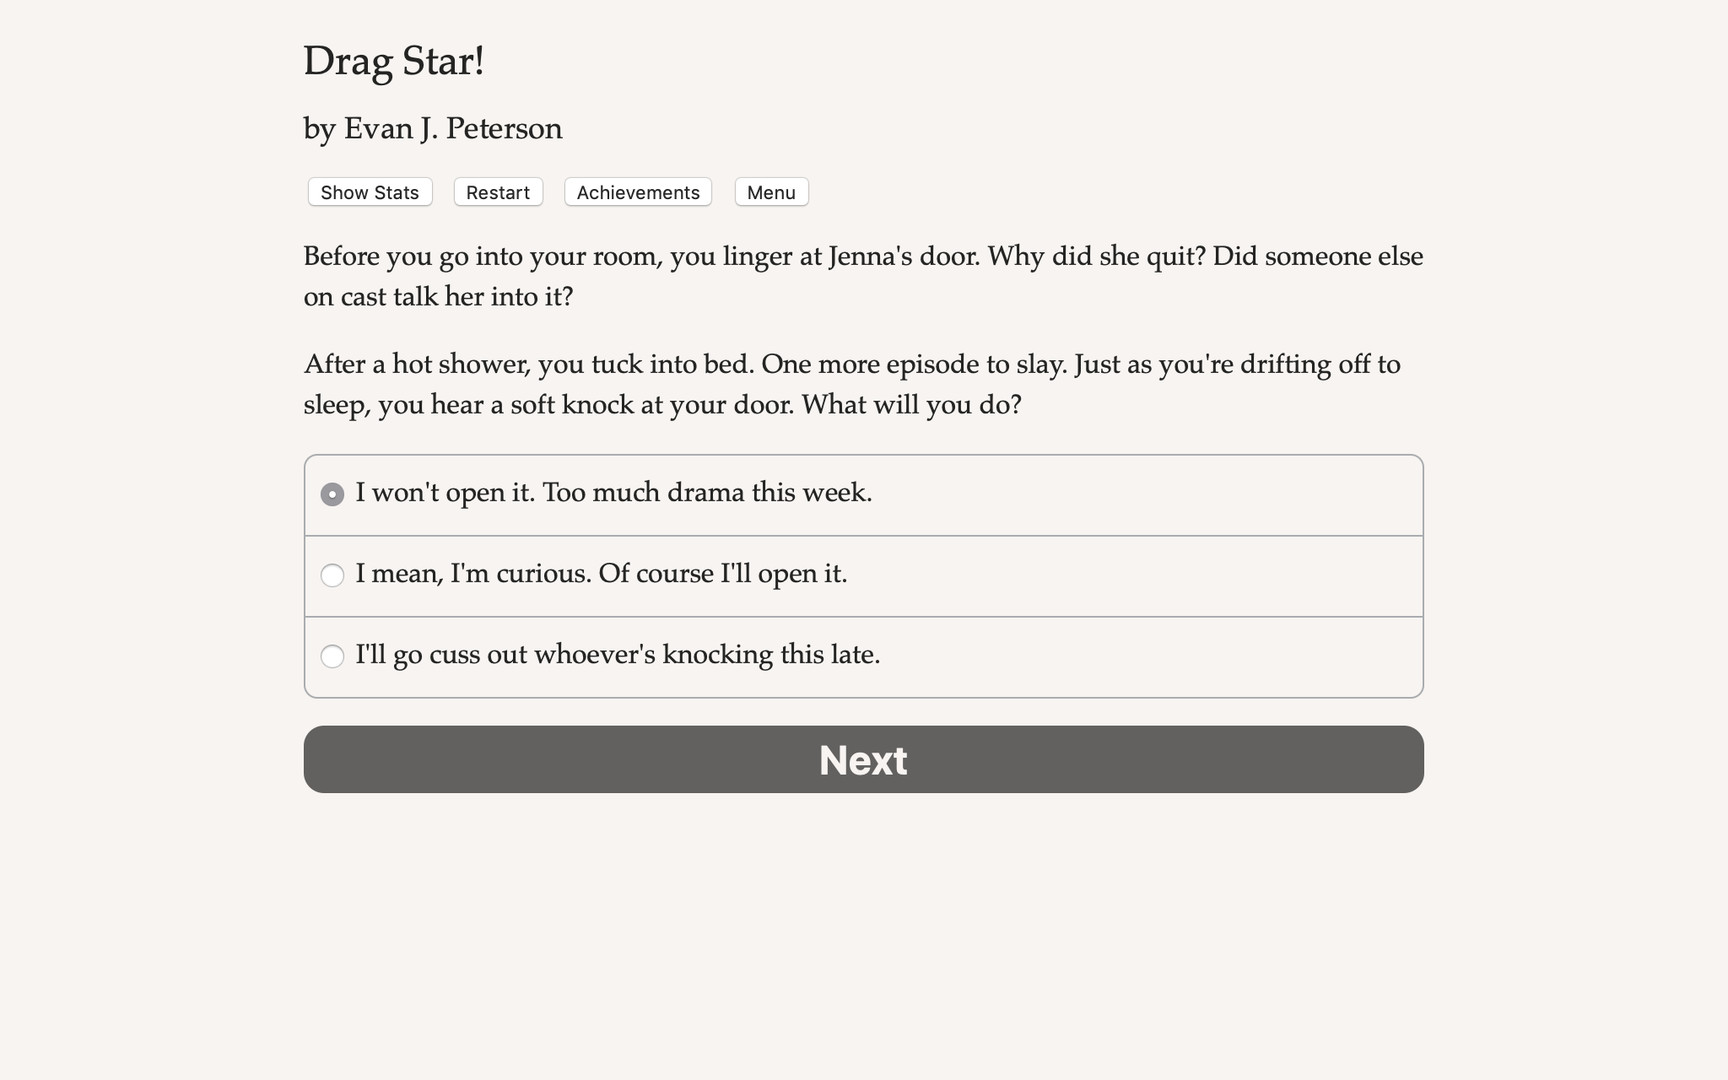 Drag Star! Free Download